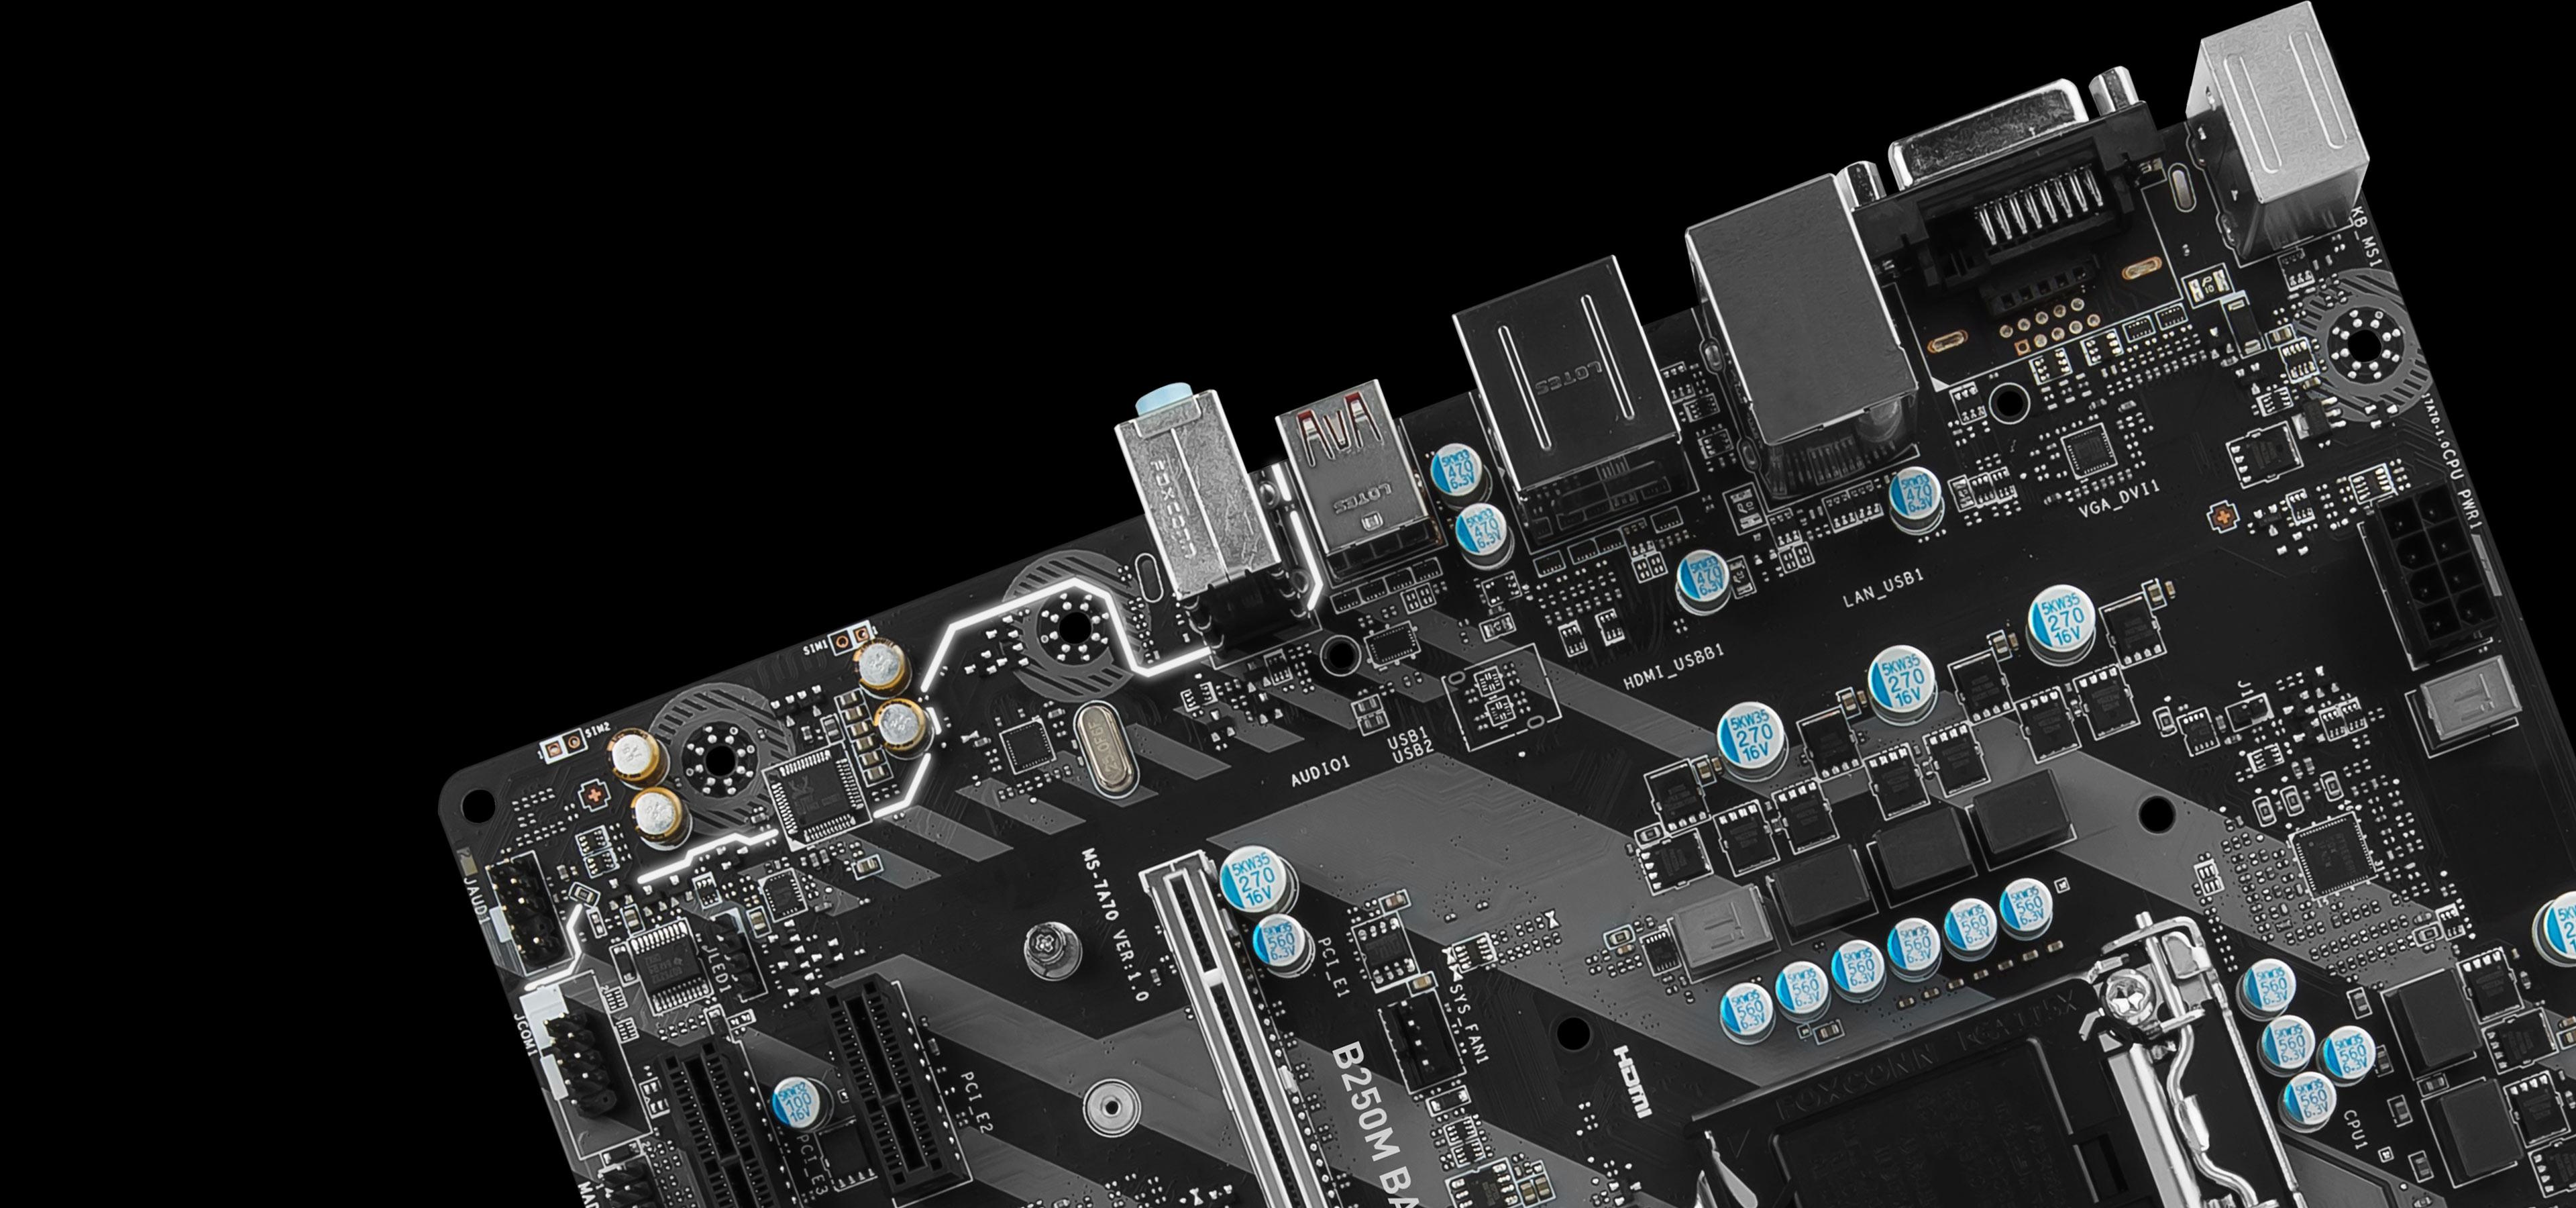 MSI M520 Chipset Drivers Windows